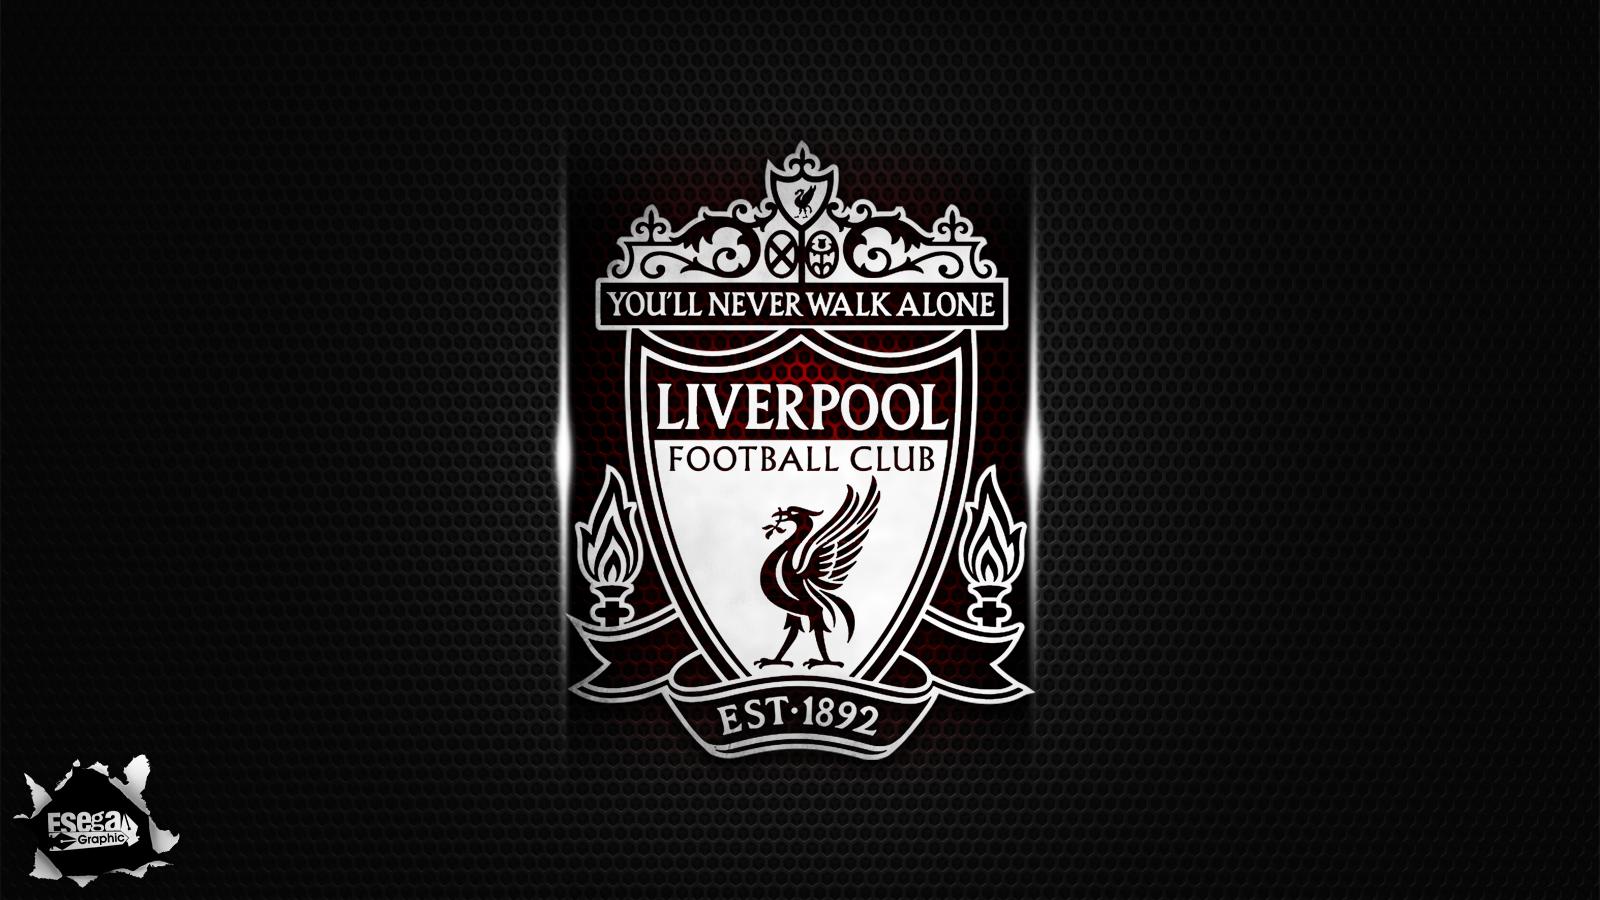 Liverpool FC Black Logo HD 2943 Wallpaper ForWallpaperscom 1600x900